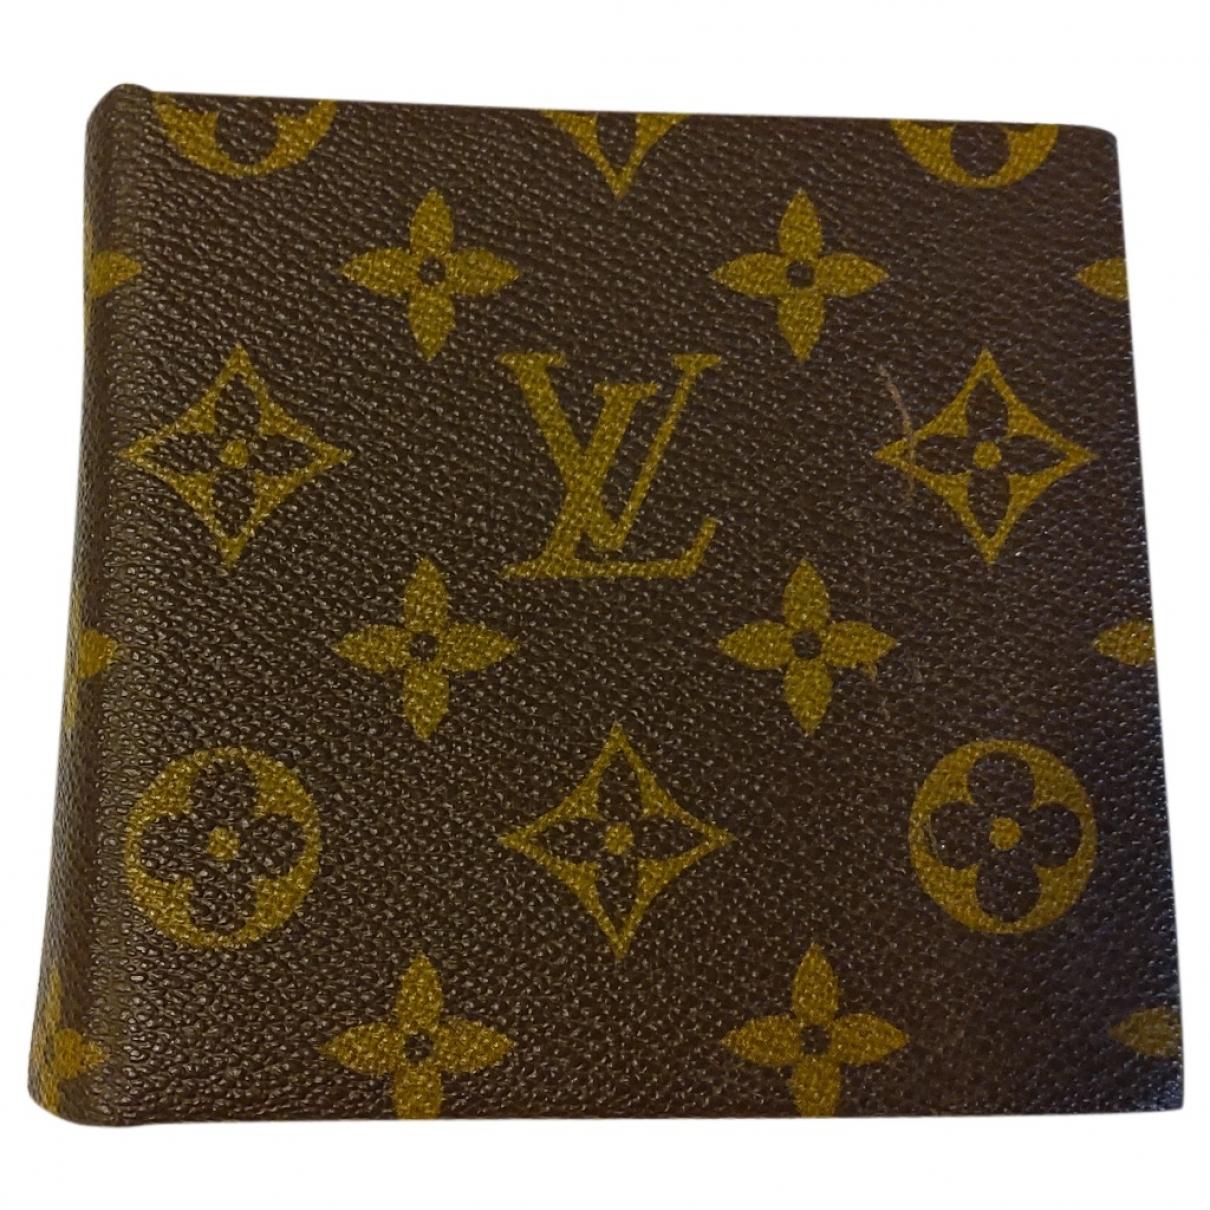 Objeto de decoracion de Lona Louis Vuitton